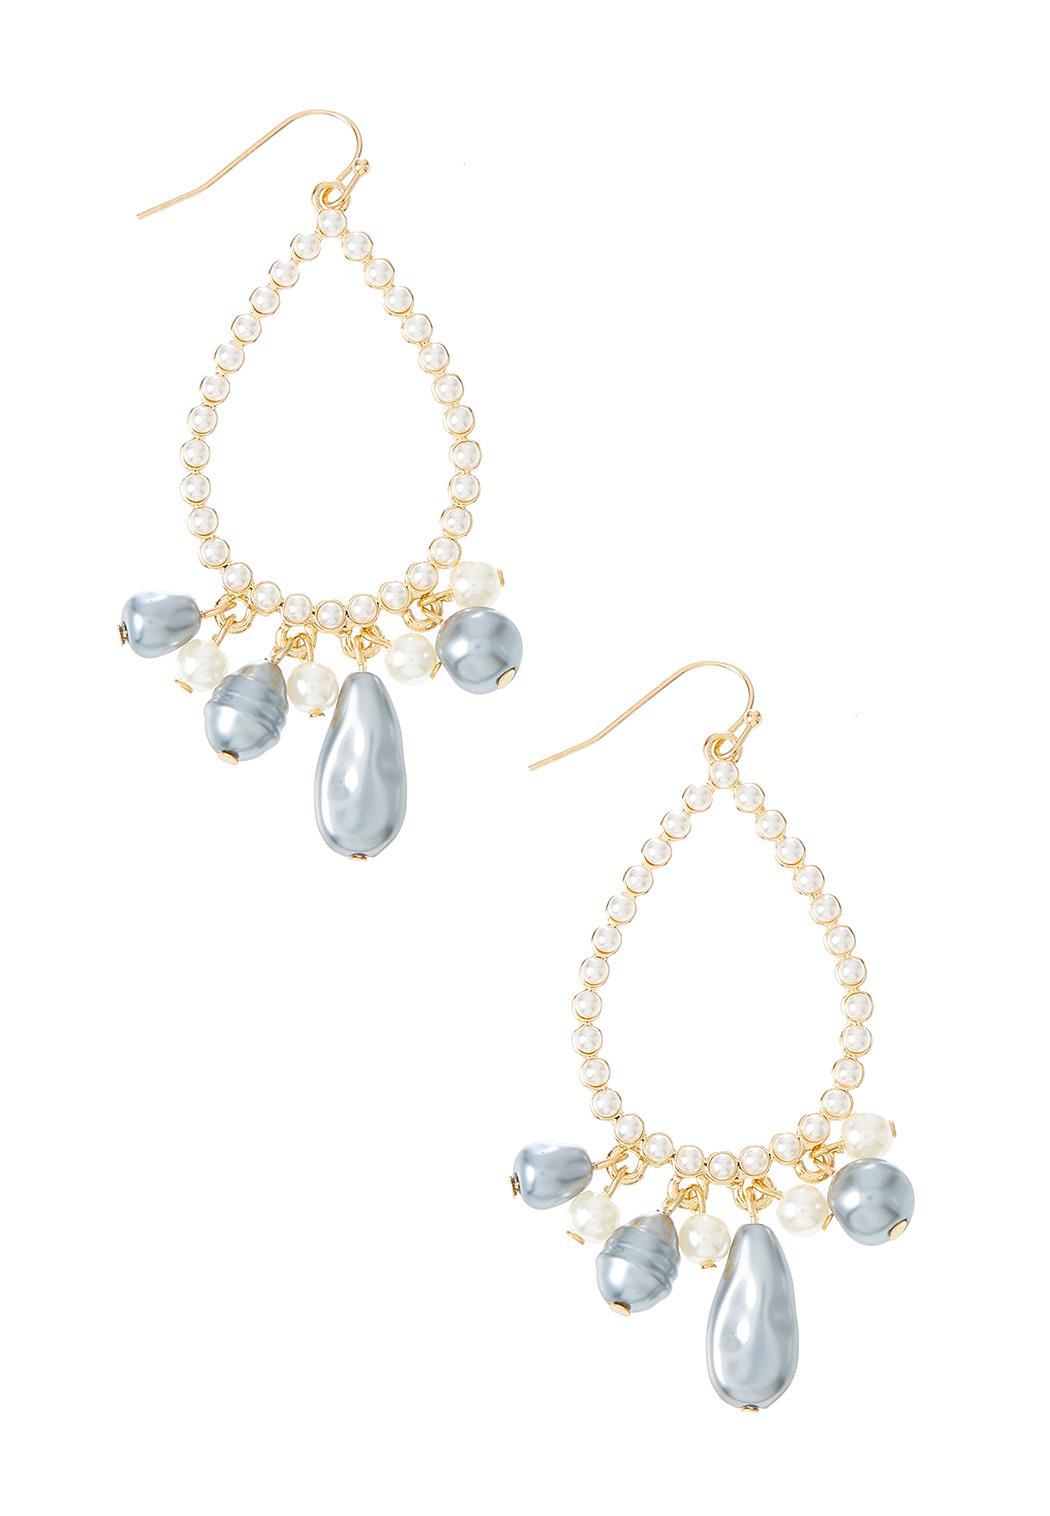 Shaky Freshwater Pearl Earrings